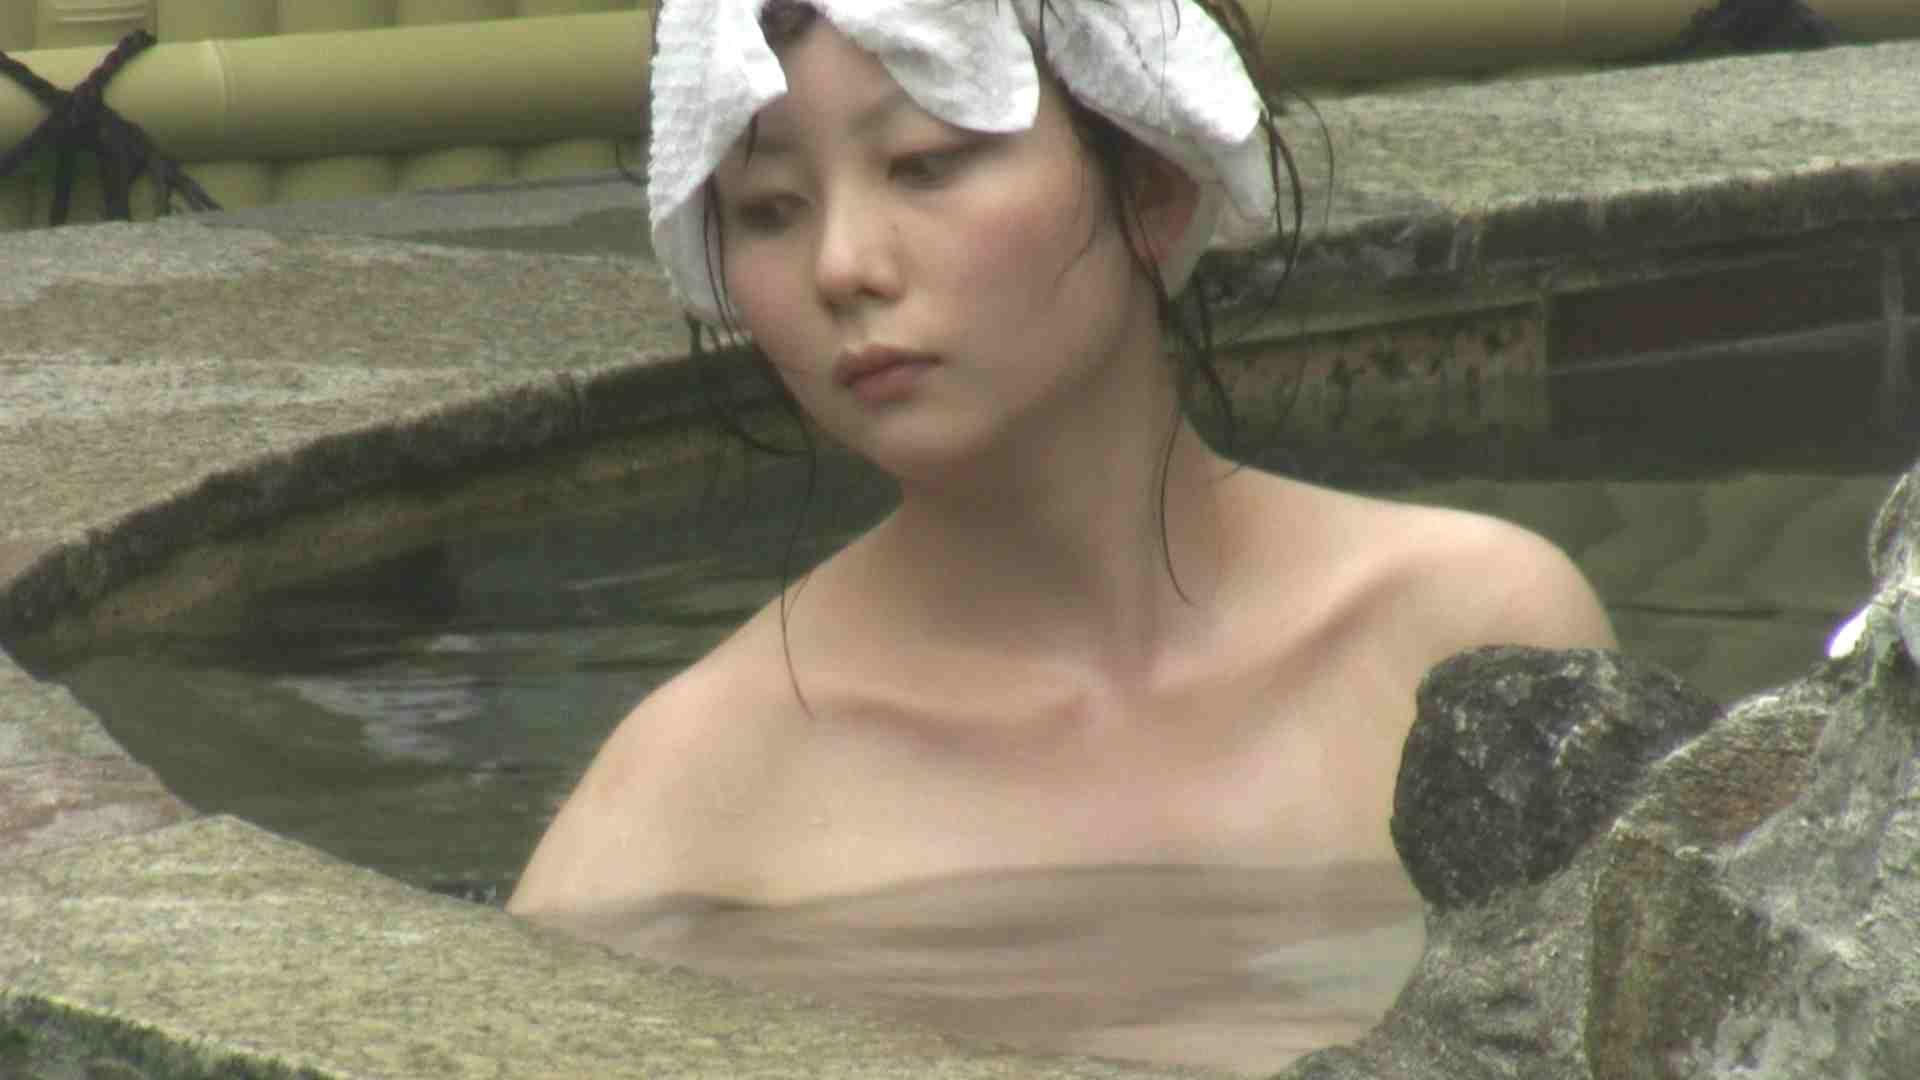 Aquaな露天風呂Vol.147 綺麗なOLたち アダルト動画キャプチャ 102枚 50